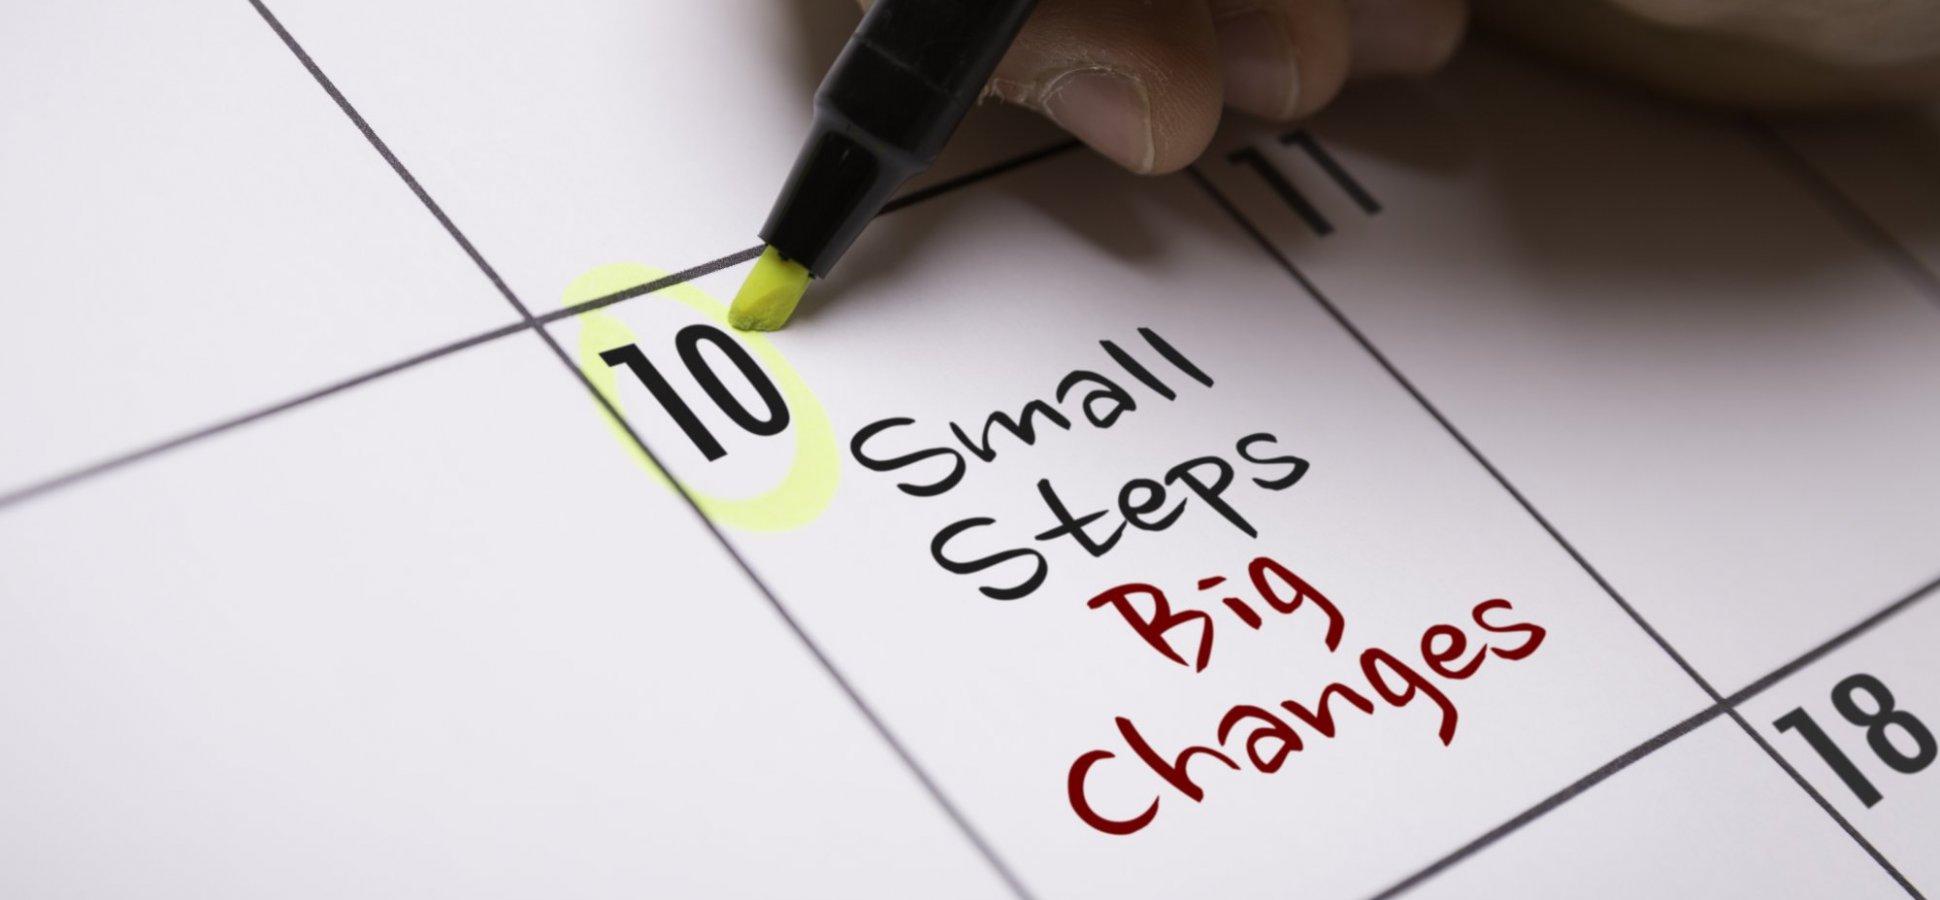 Beat Procrastination by Starting Small